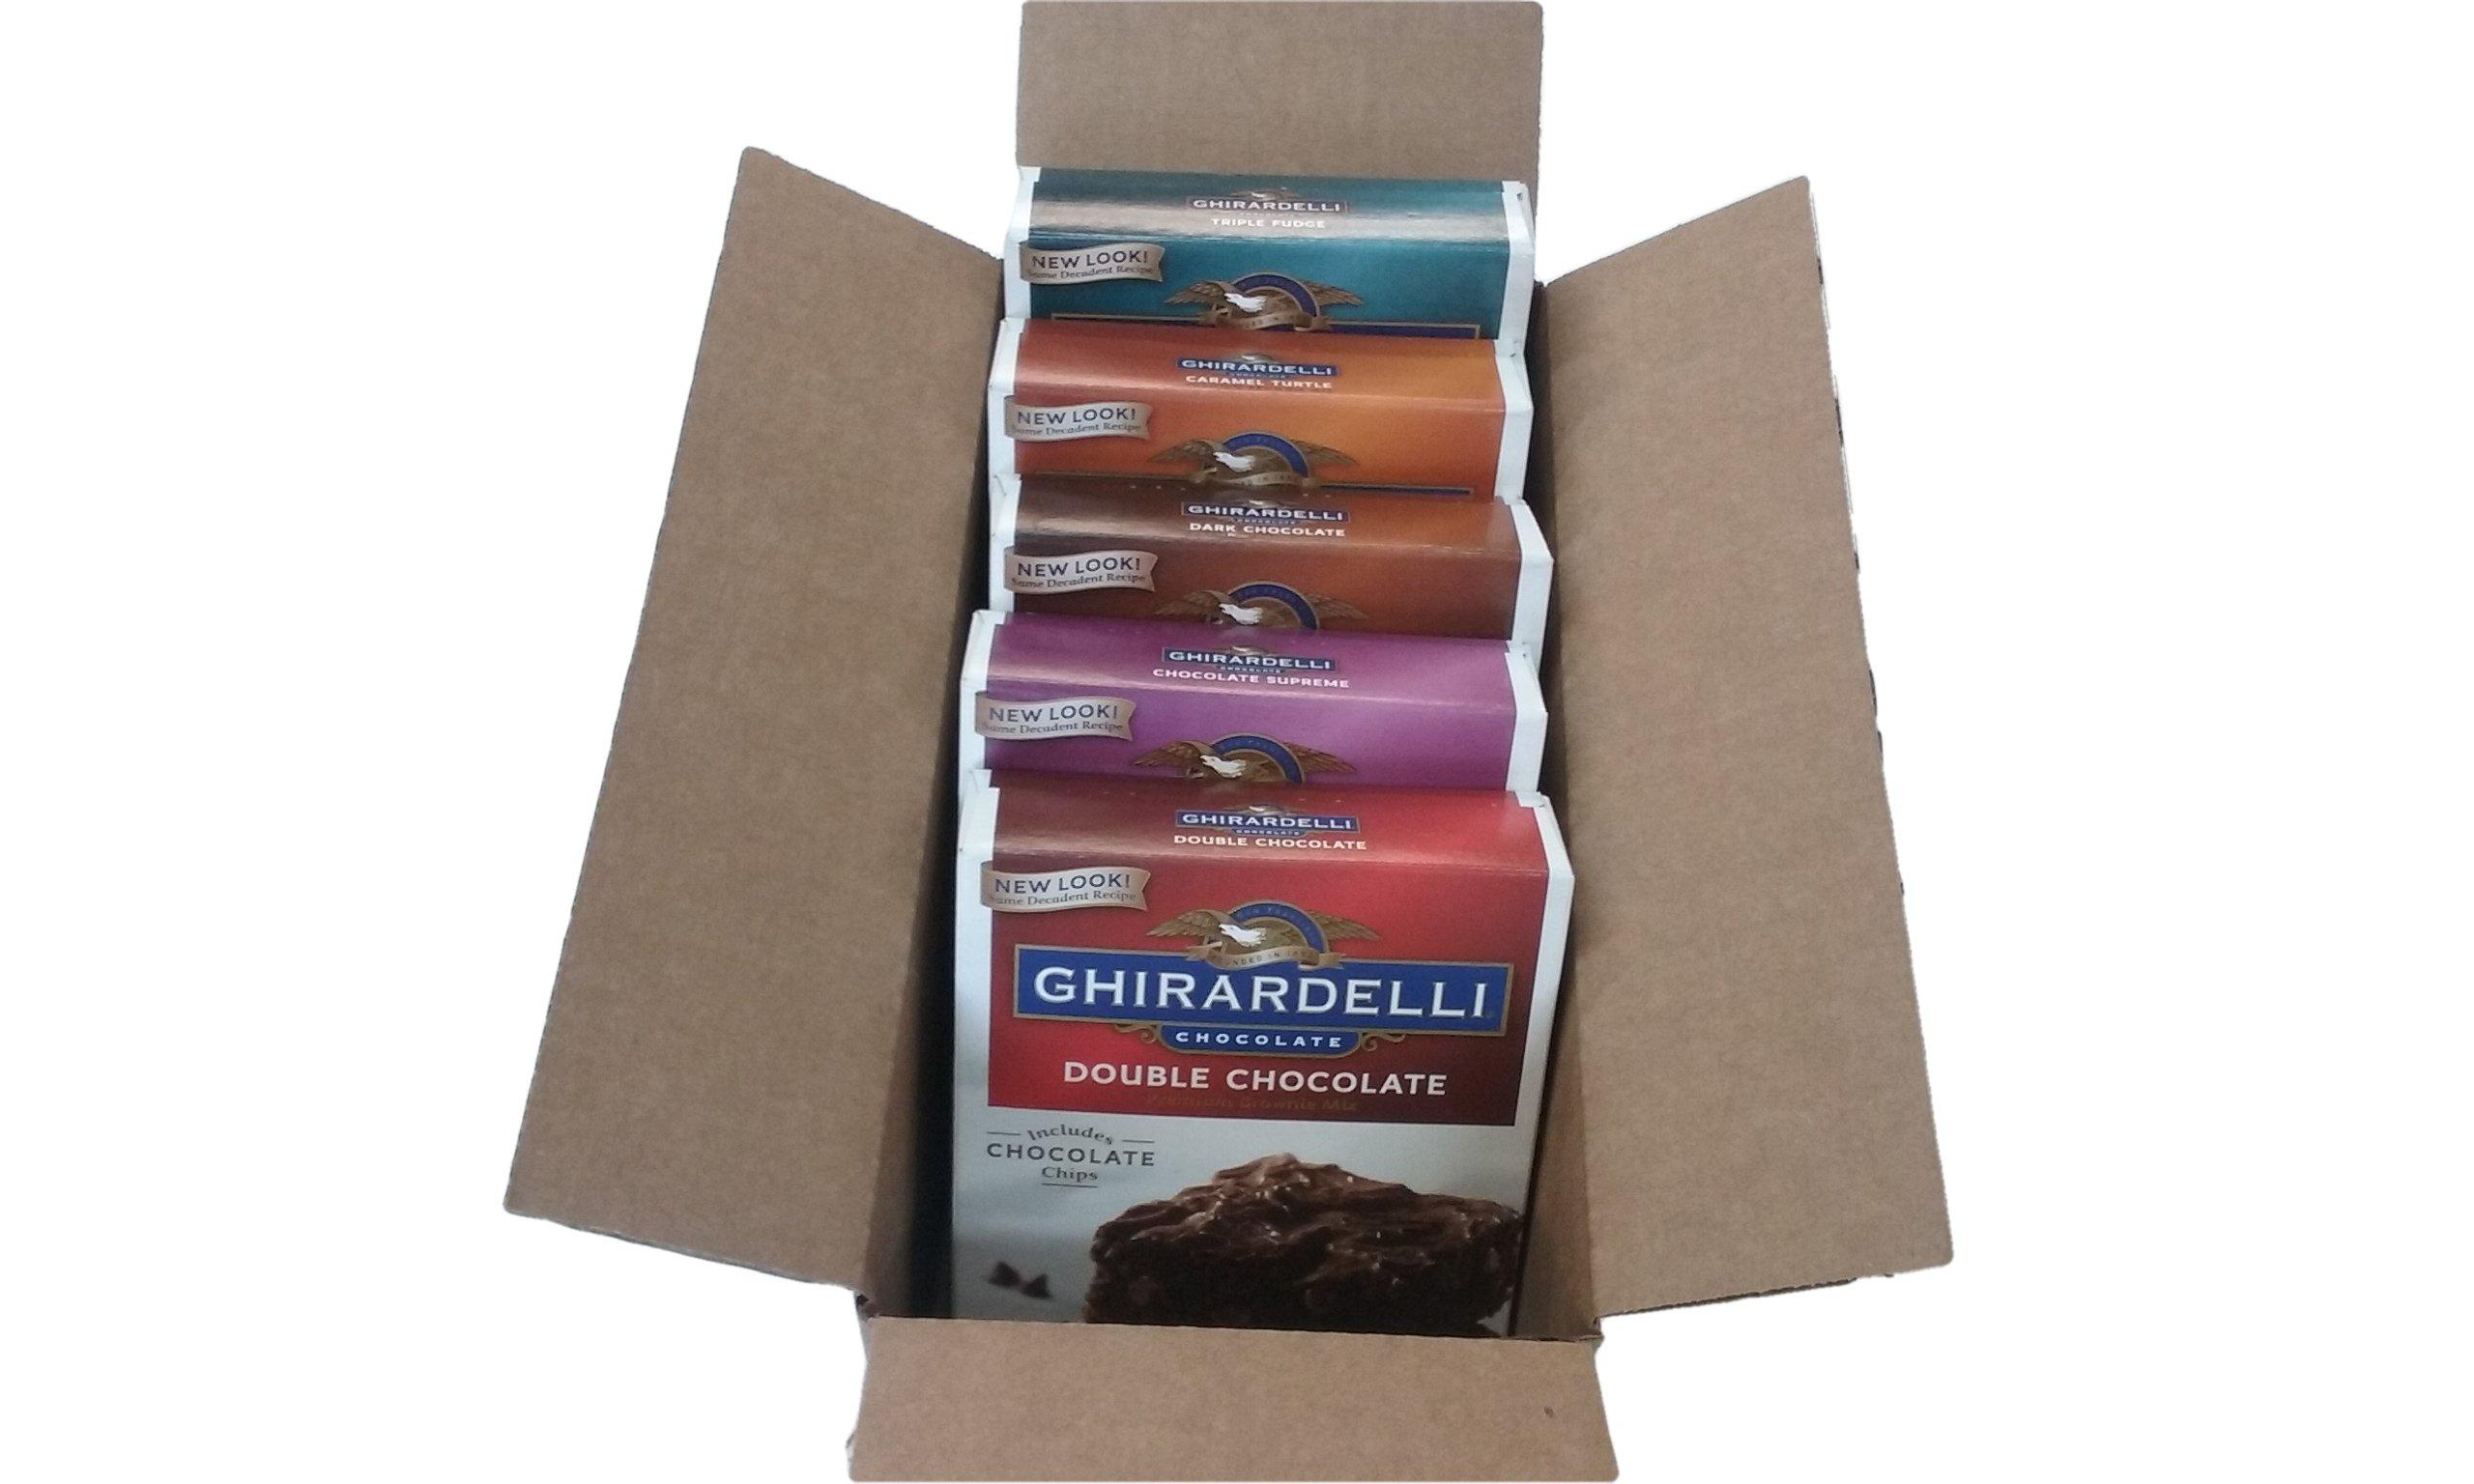 Ghirardelli Premium Chocolate Brownie Mix Variety - Bundle of 5 Flavors - Triple Fudge, Caramel Turtle, Double Chocolate, Chocolate Supreme, Dark Chocolate Gift Box by Narrow Path Sales (Image #3)